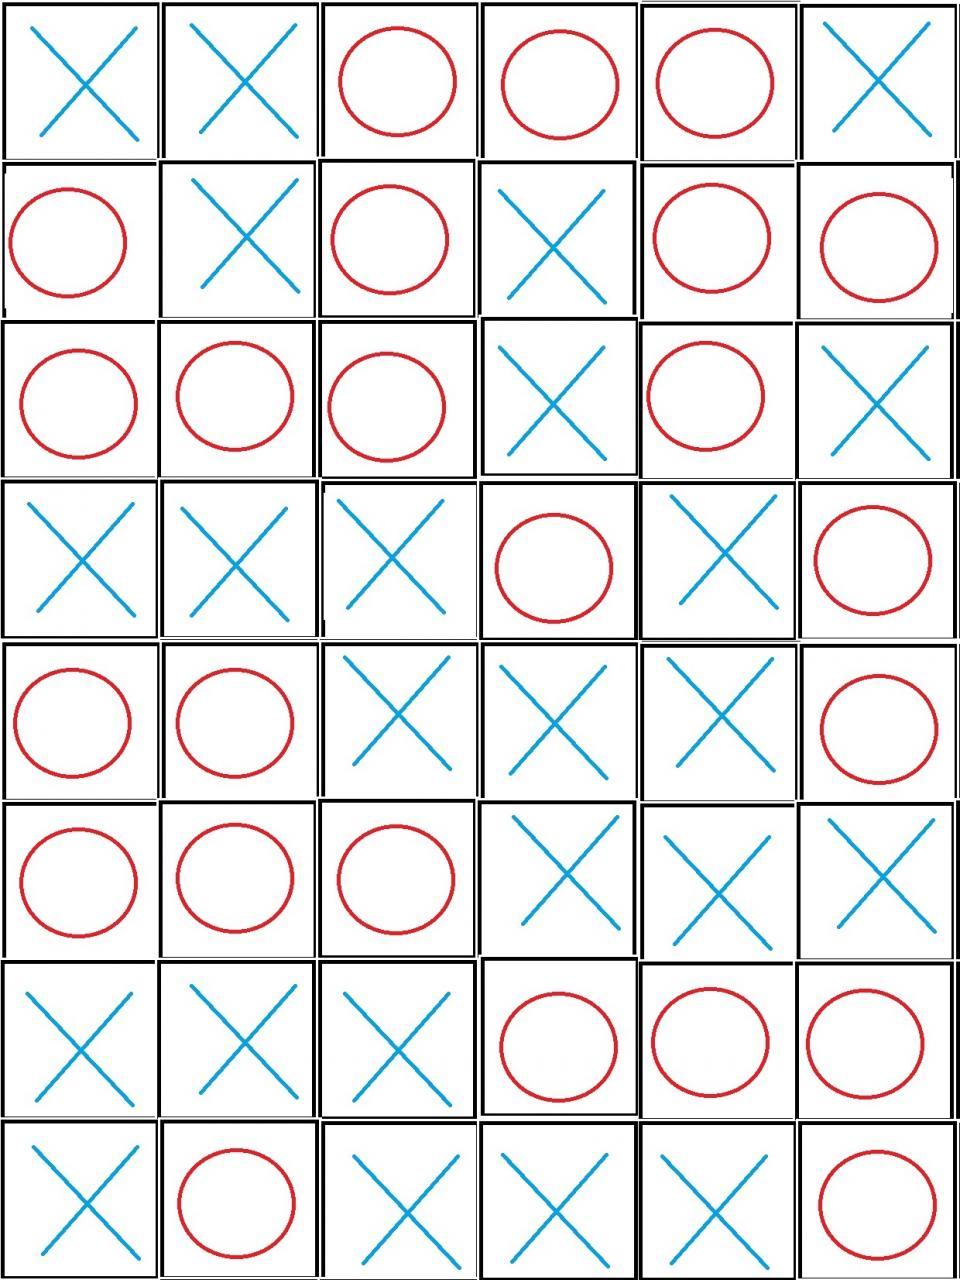 Pathfinder: Wrath of the Righteous - Solución del Puzle Enigma 4